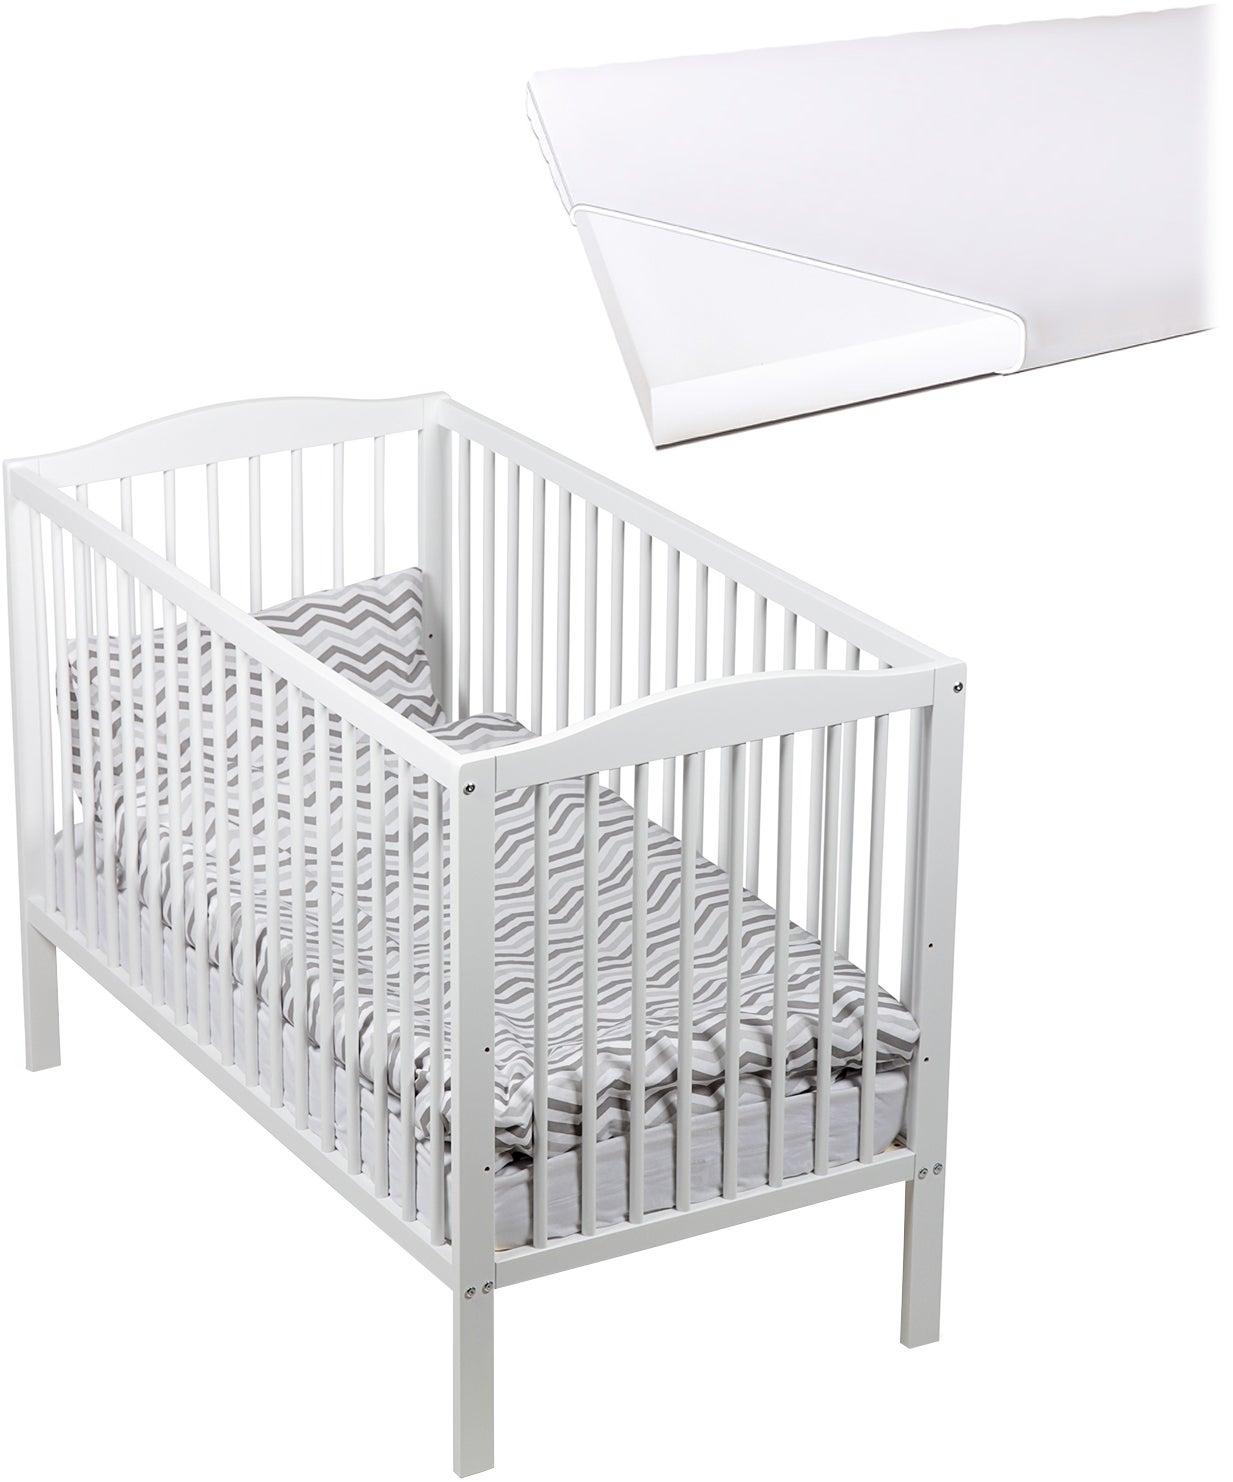 JLY Dream Spjälsäng med BabyMatex Softi Madrass 60x120, Vit